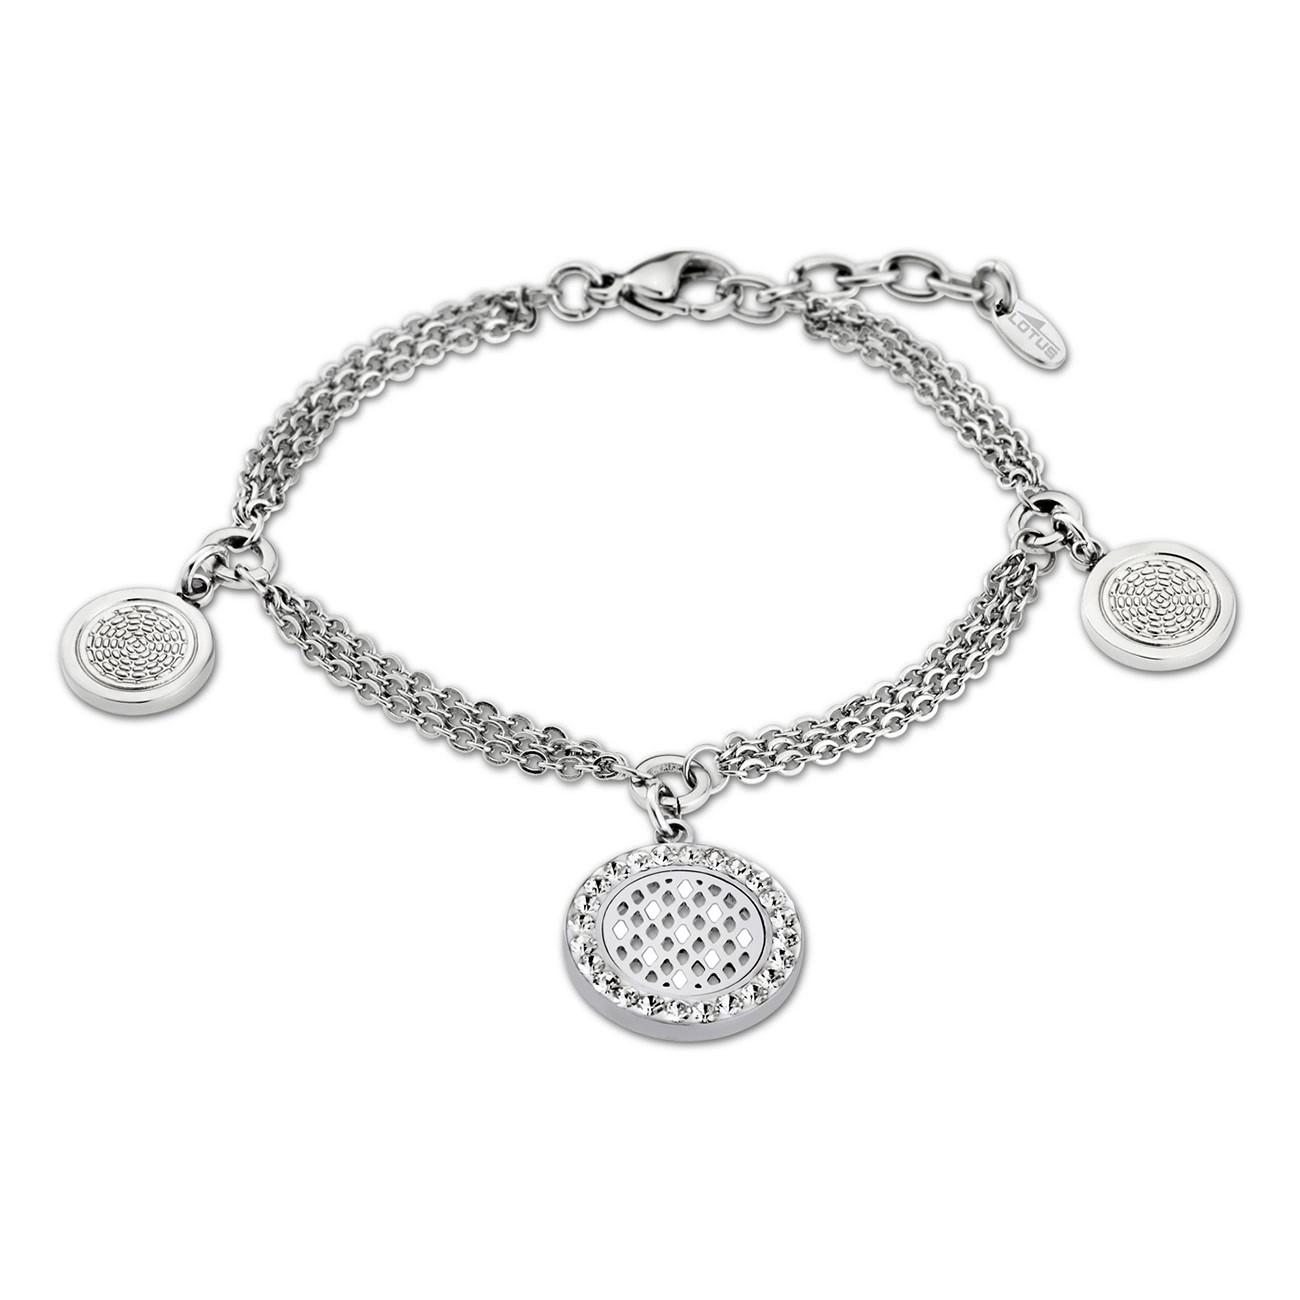 LOTUS Style Armband Damen Edelstahl silber LS1777-2/1 Privilege JLS1777-2-1